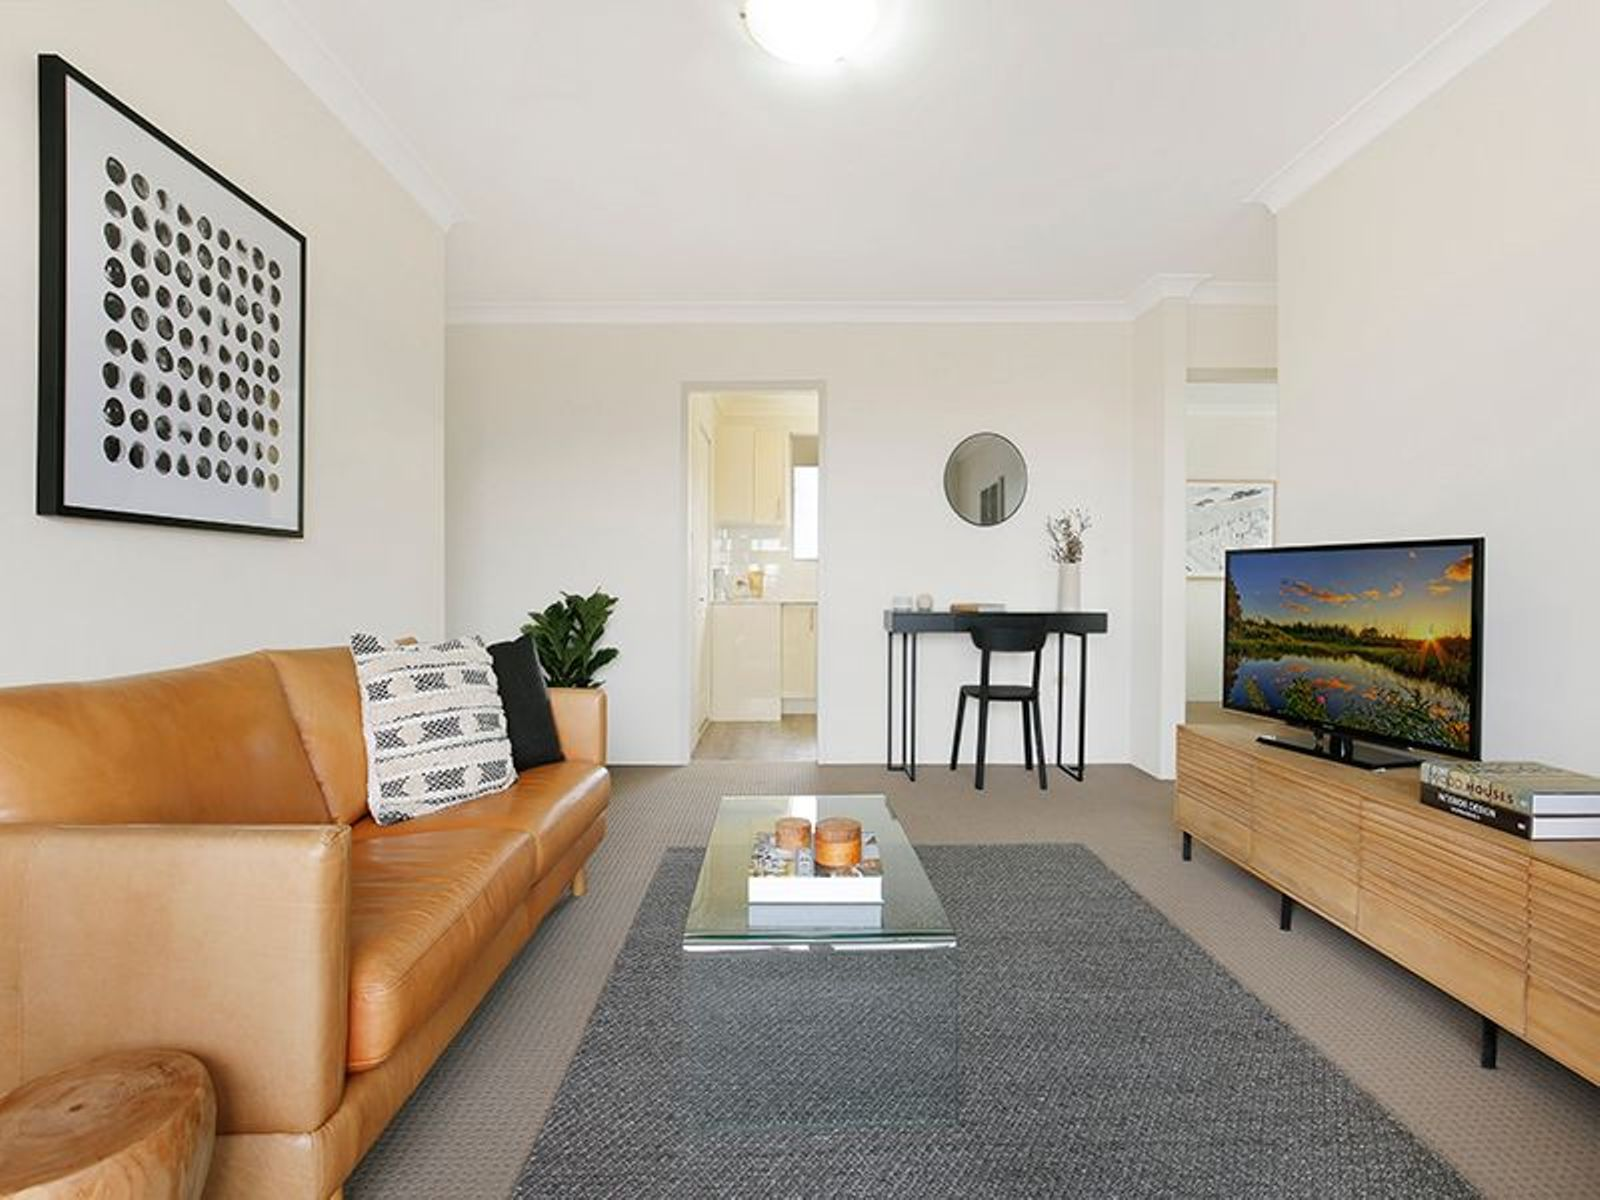 3/9 Keira Street, Wollongong, NSW 2500